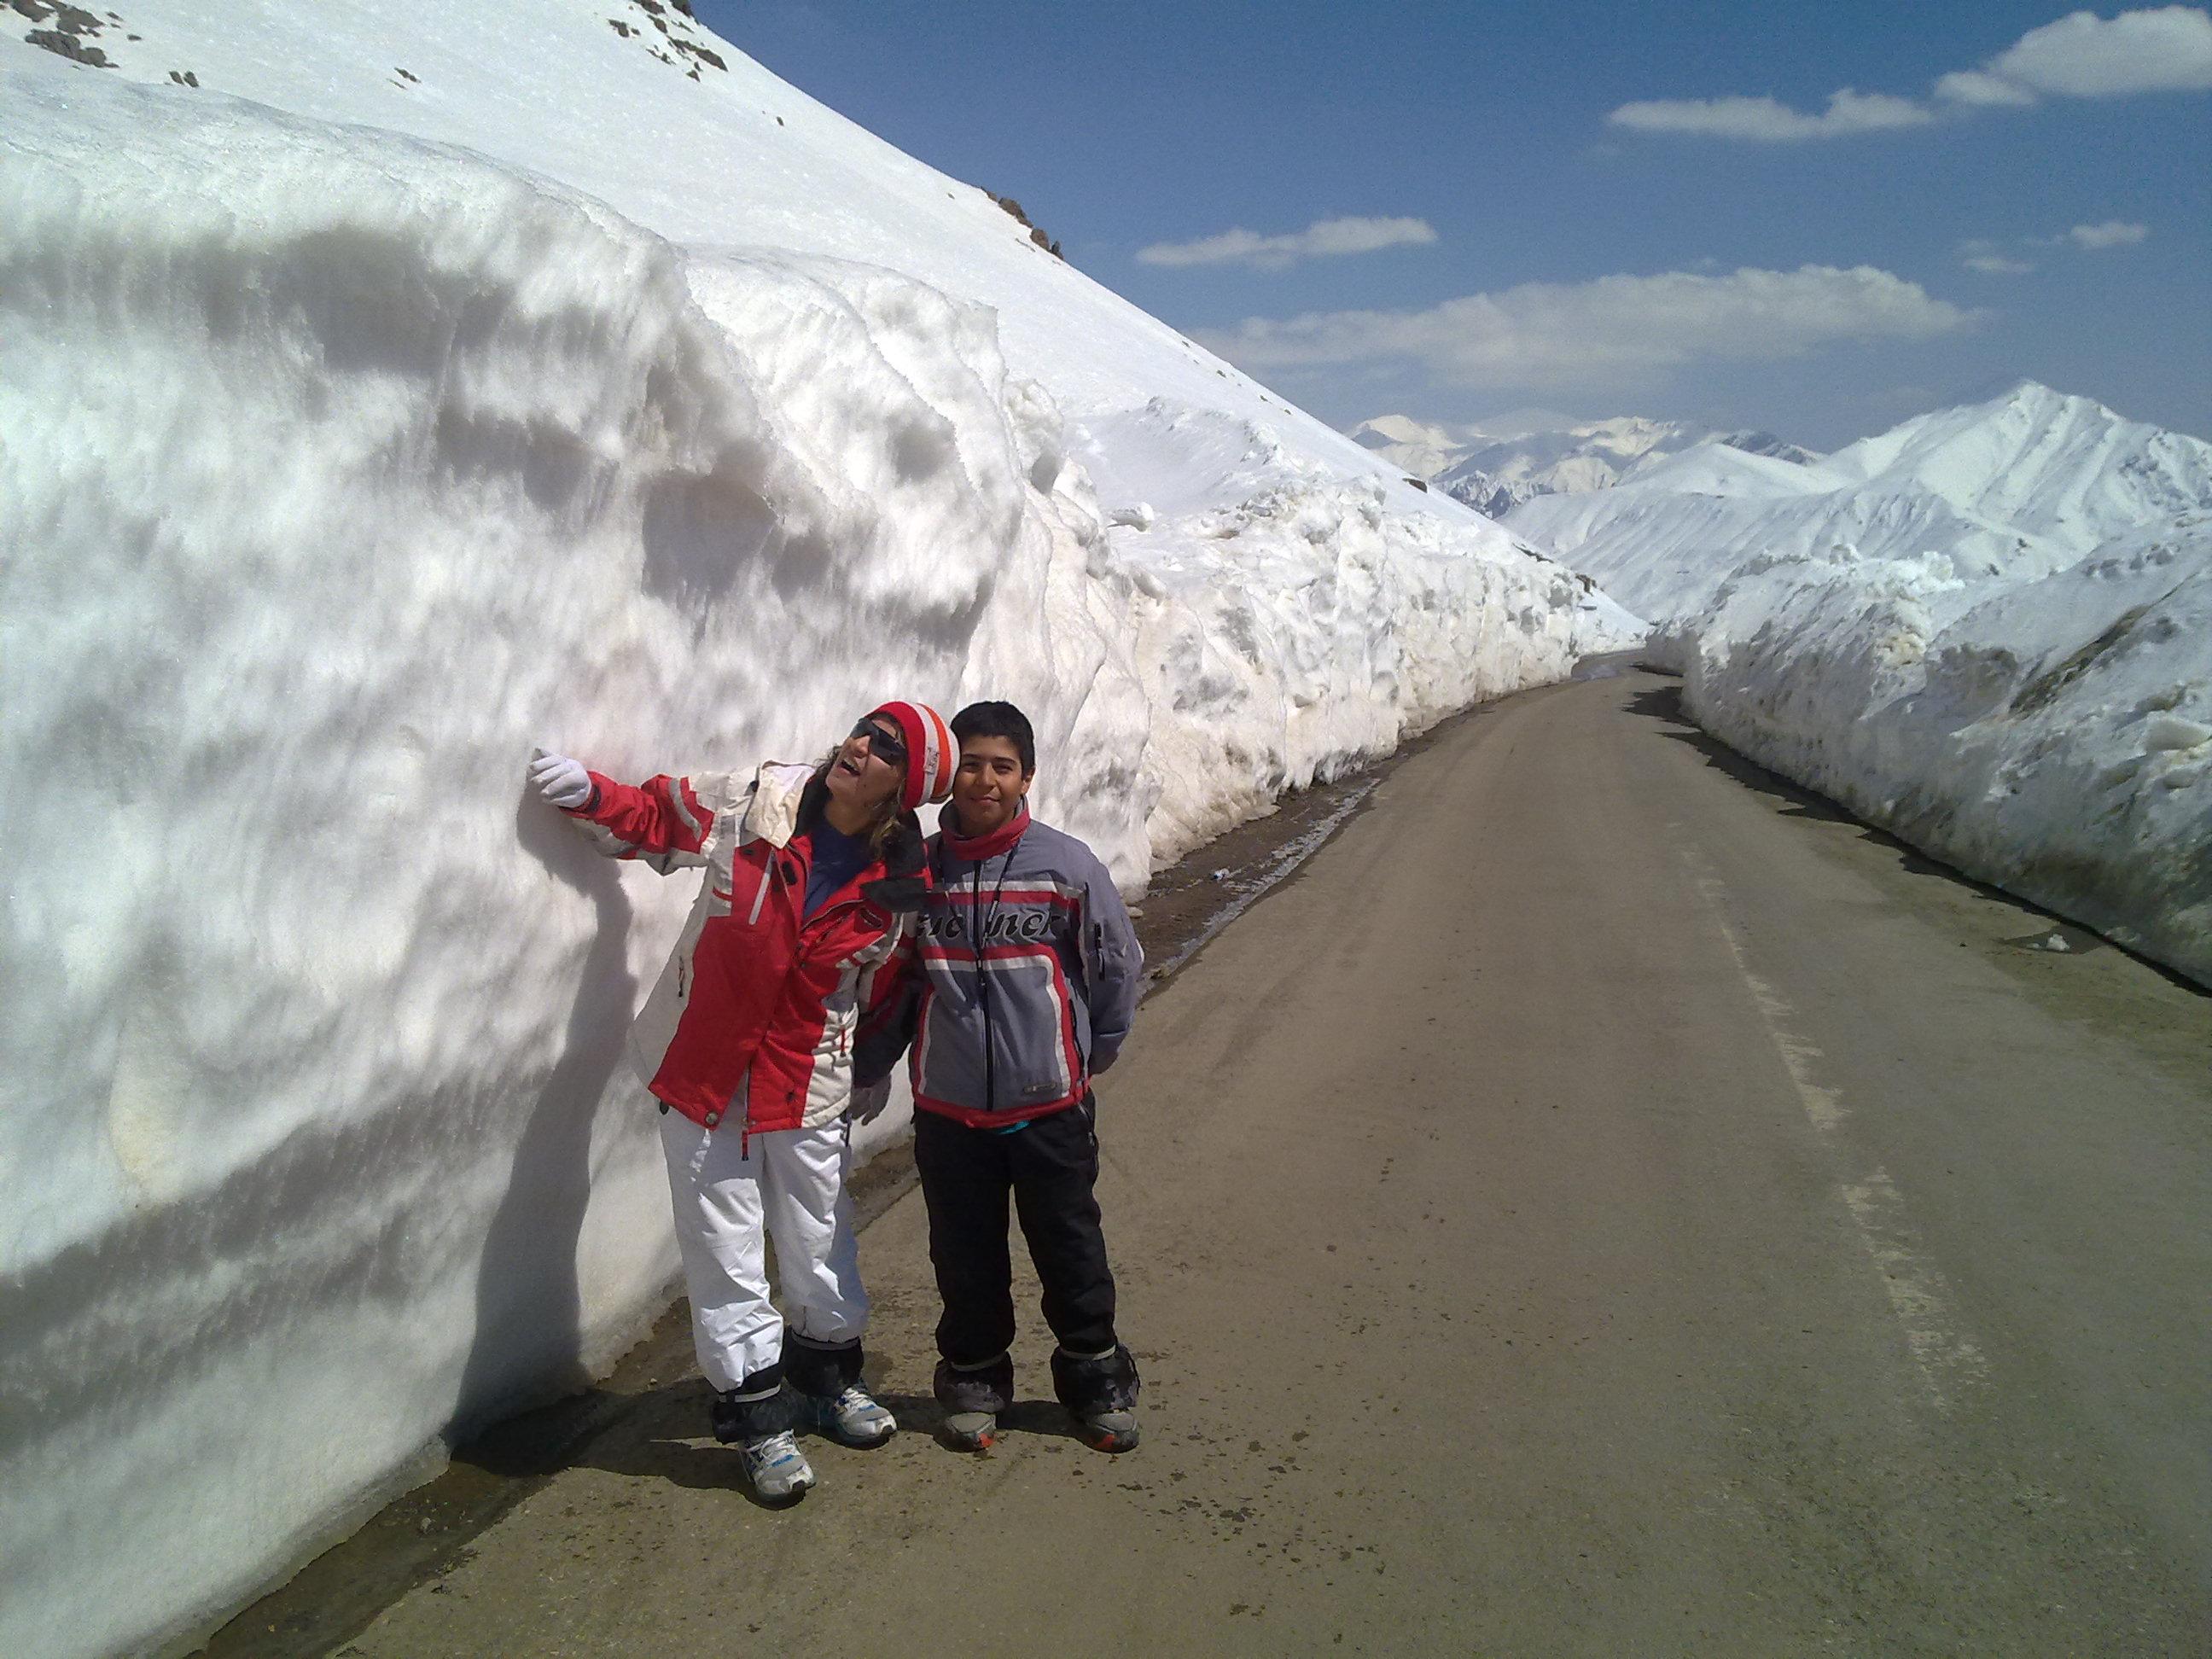 dream snow on the road, Dizin